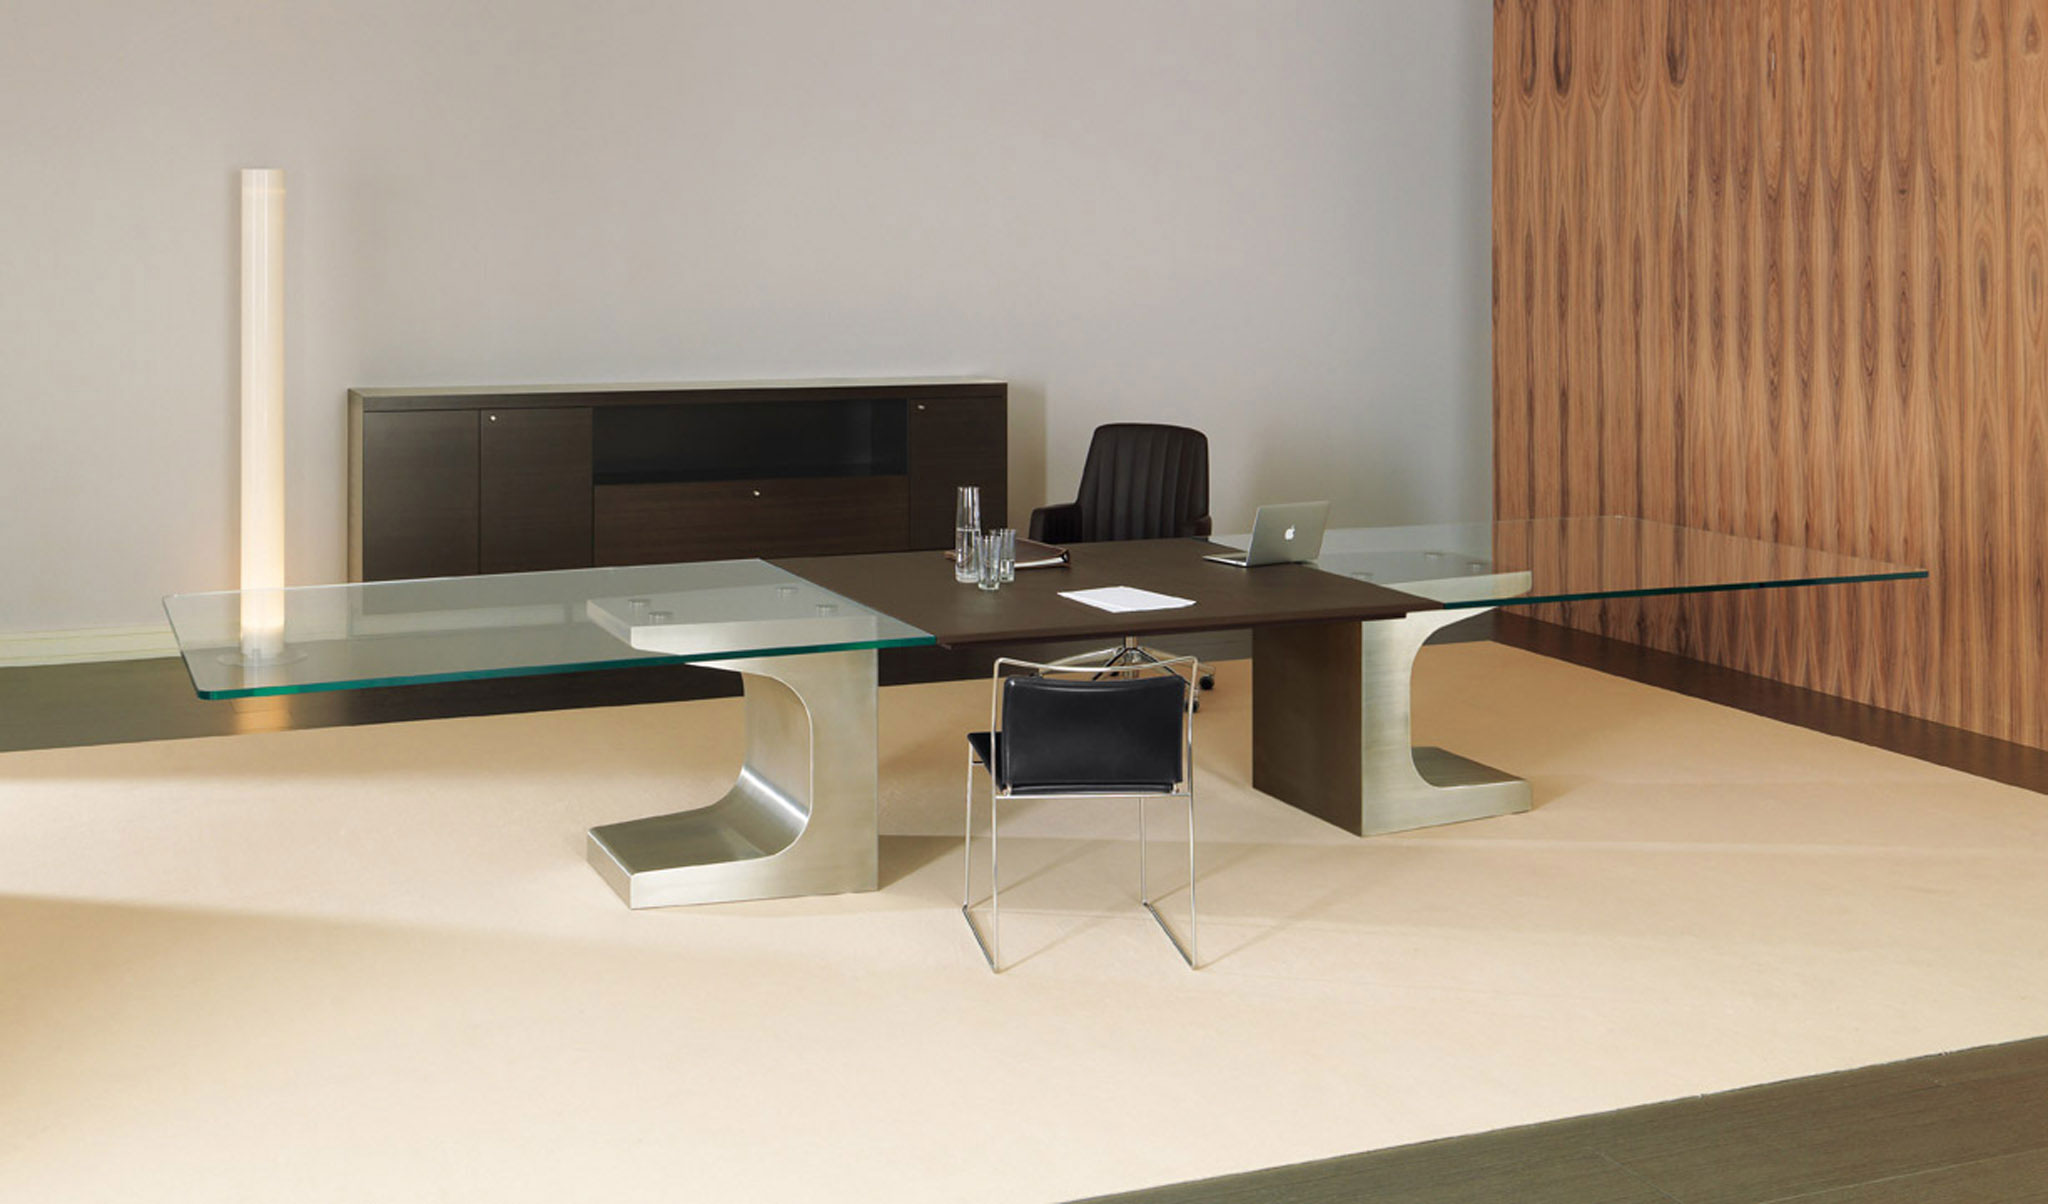 beautiful negozi arredamento parma gallery - ameripest.us ... - Bertani Parma Arredo Bagno